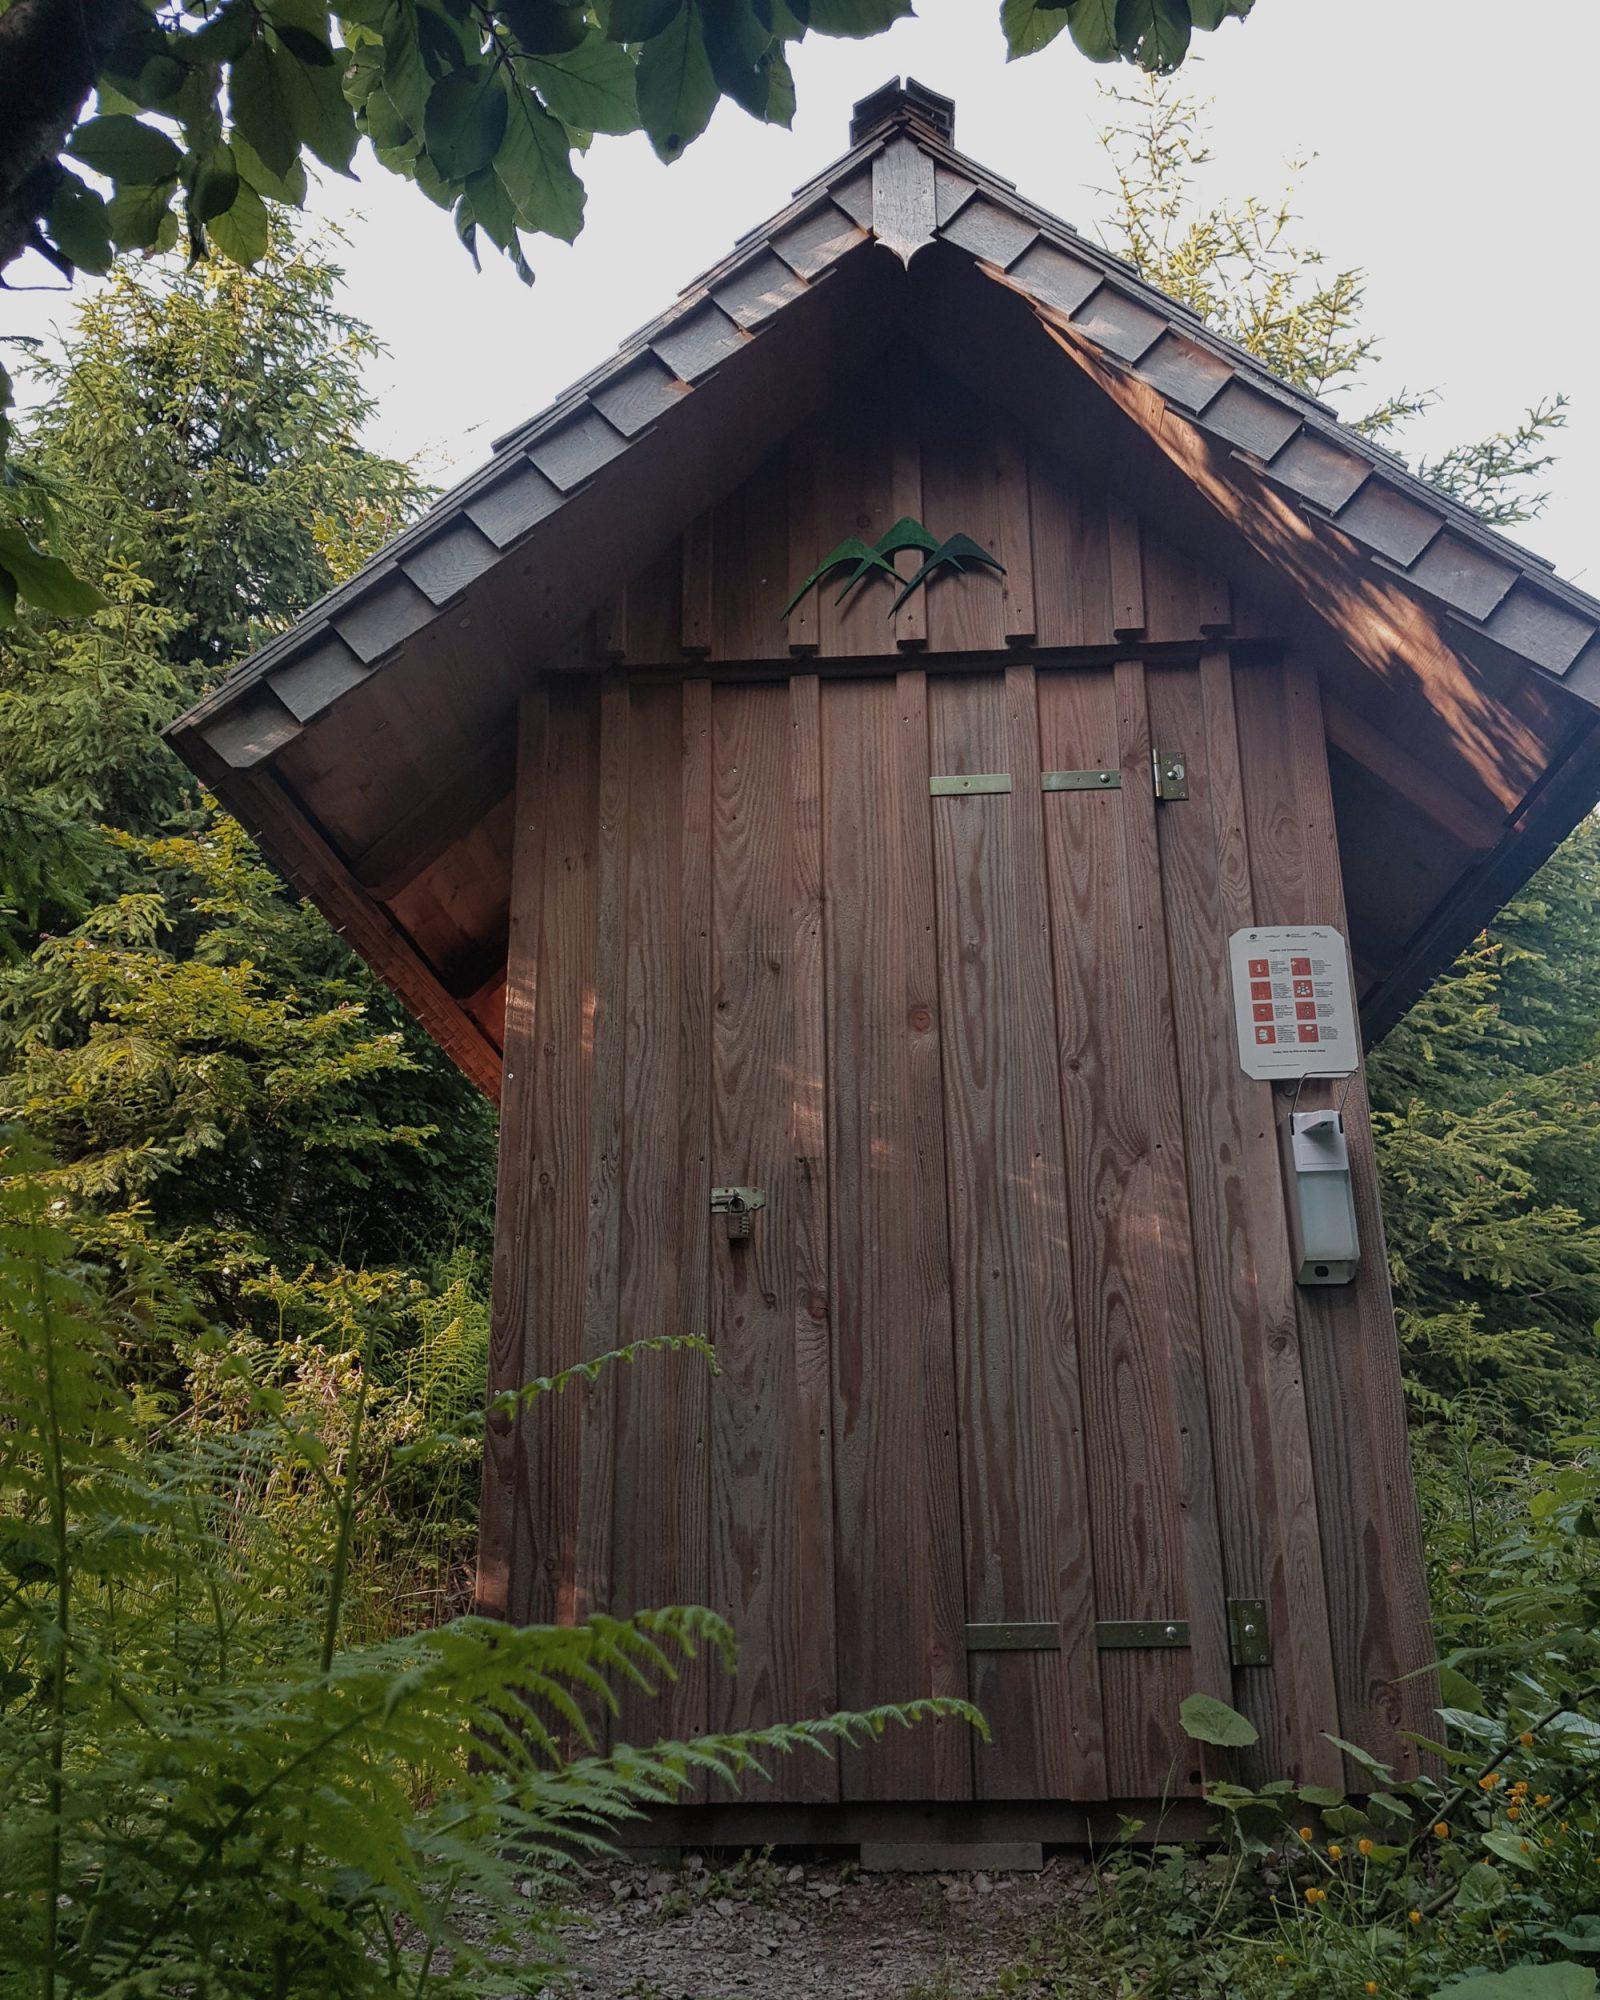 Toilettenhäuschen des Trekking-Camps Seibelseckle